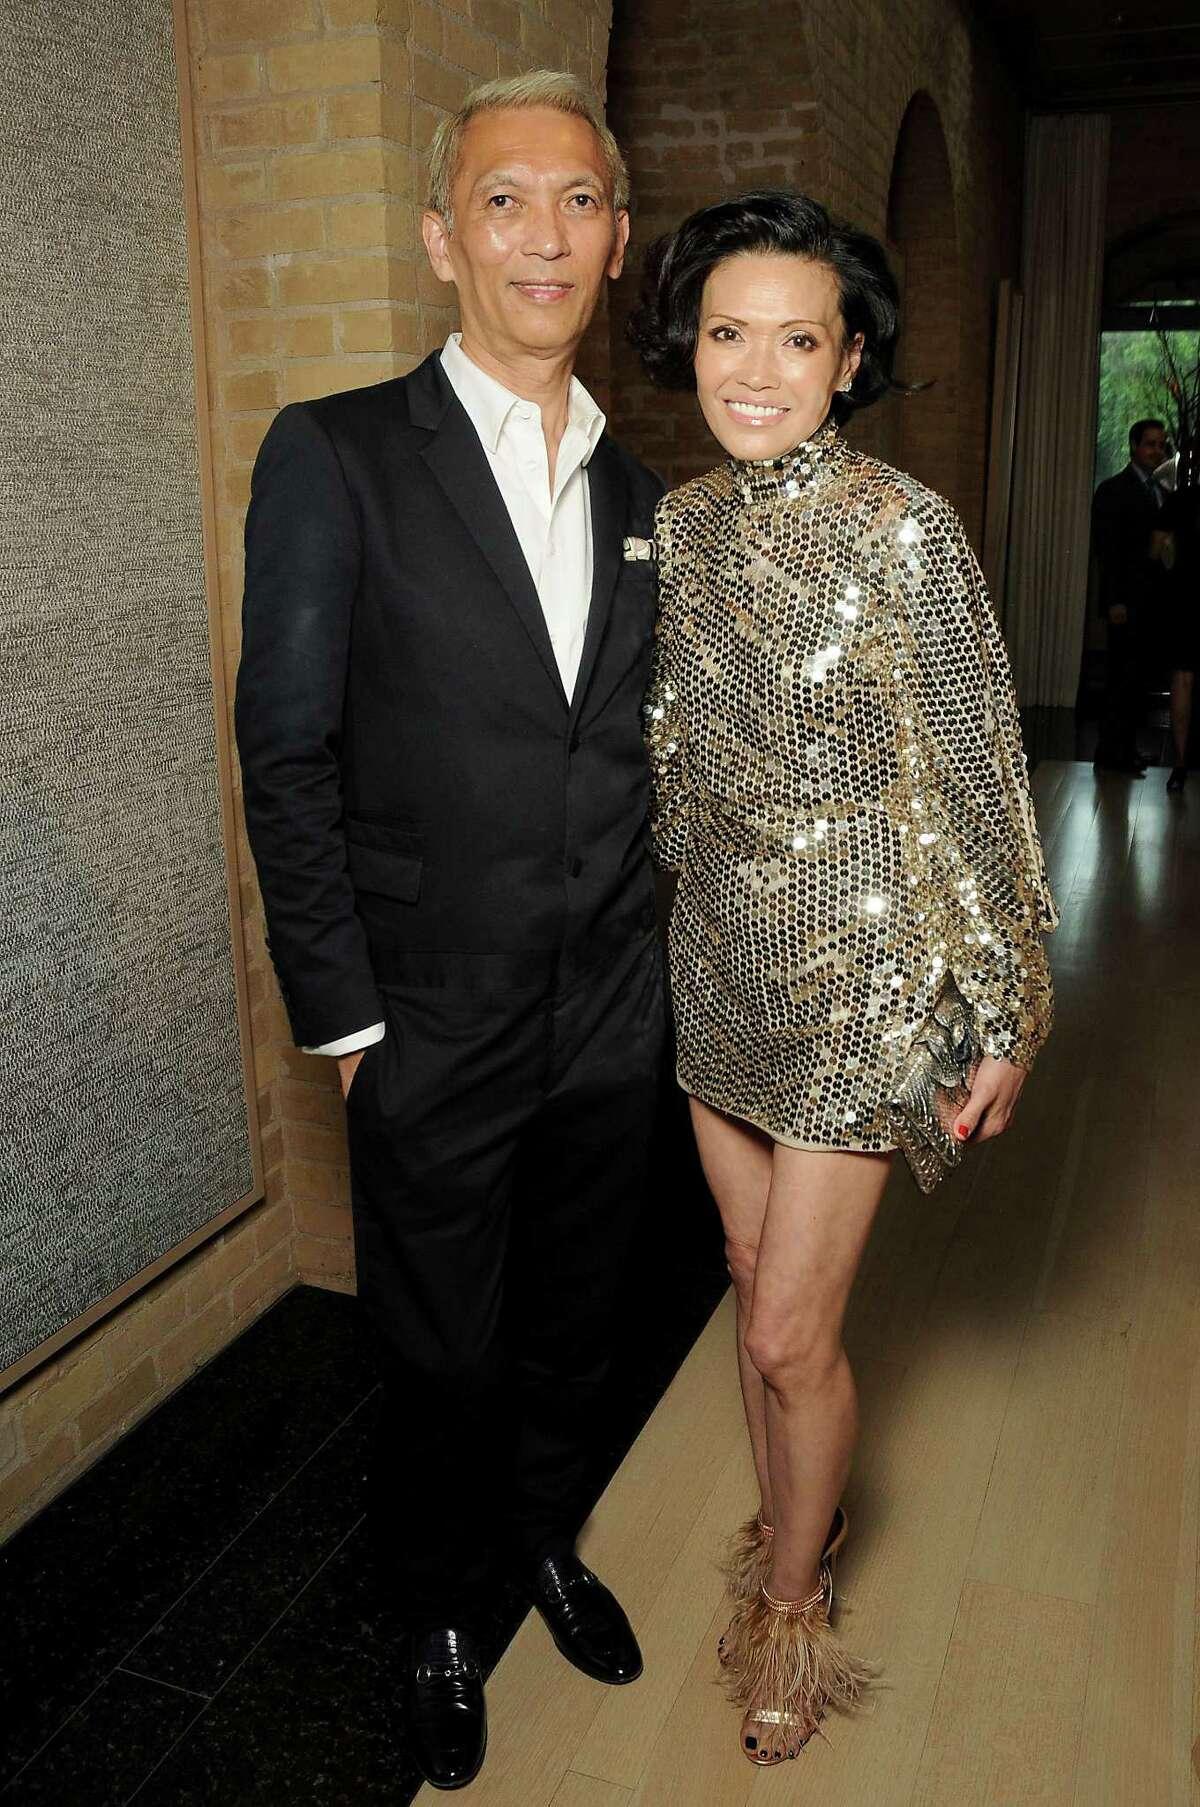 Left: Duyen and Marc Nguyen. Right: Hosts John Thrash and Becca Cason Thrash